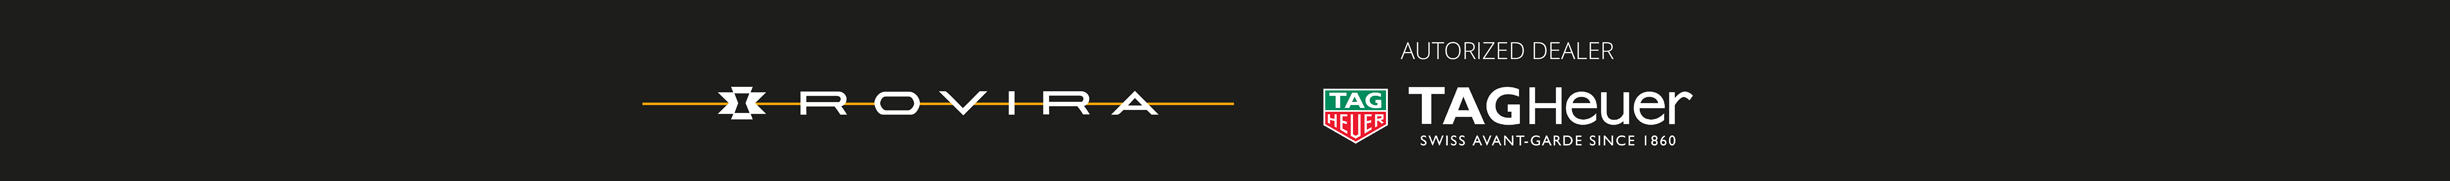 EN-ROVIRA-Slides-Rovira-BANNER-TAG.jpg